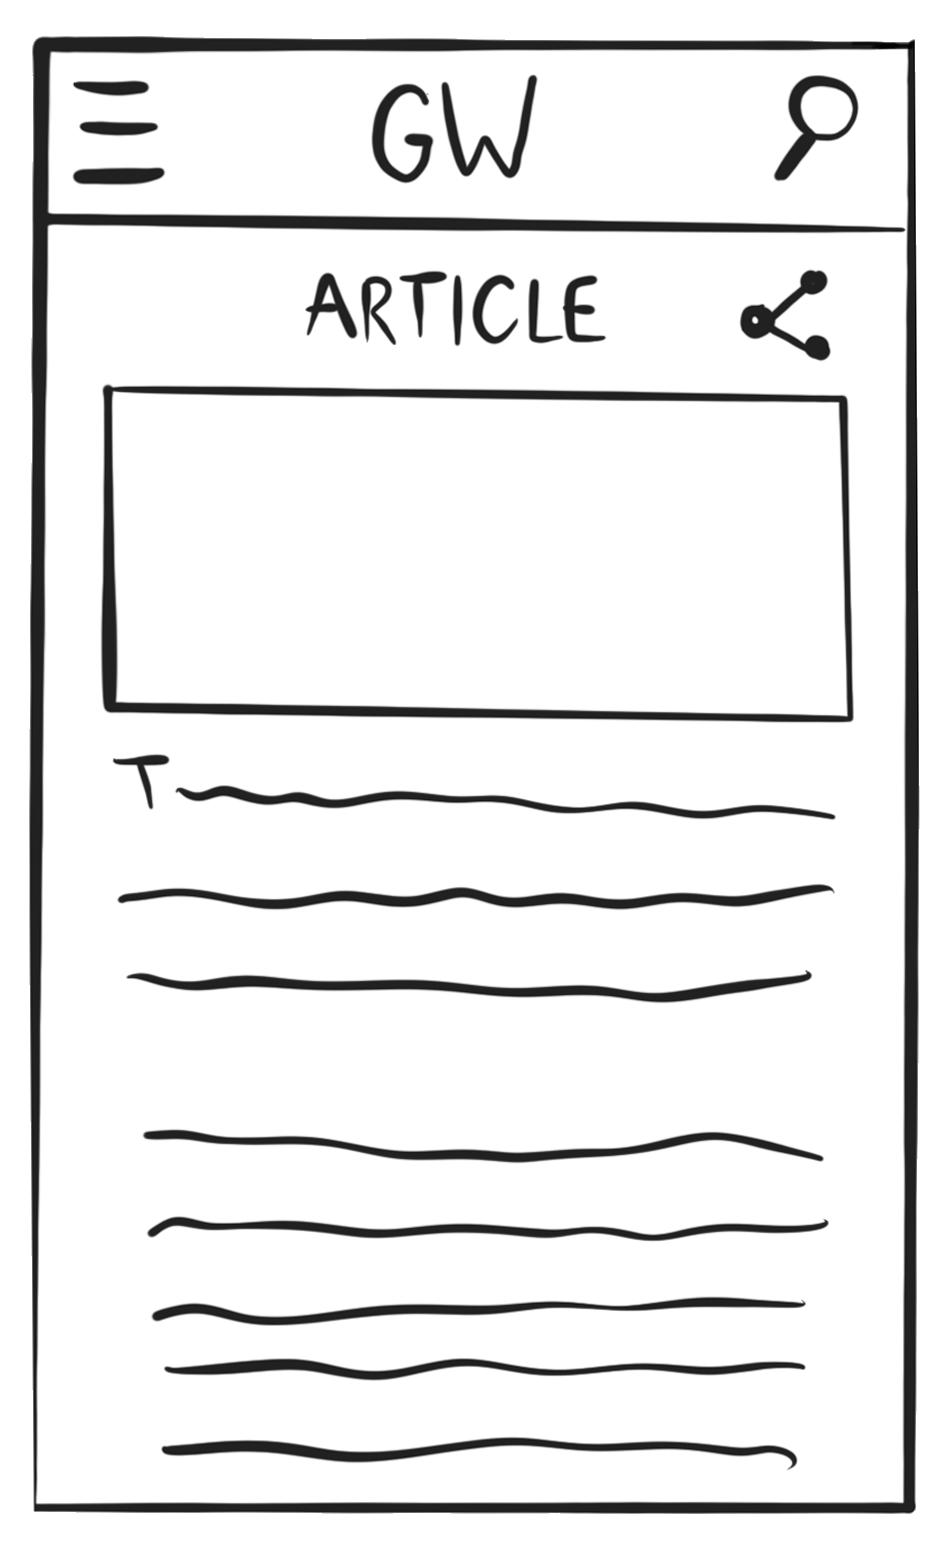 2.0_Article_Sketch